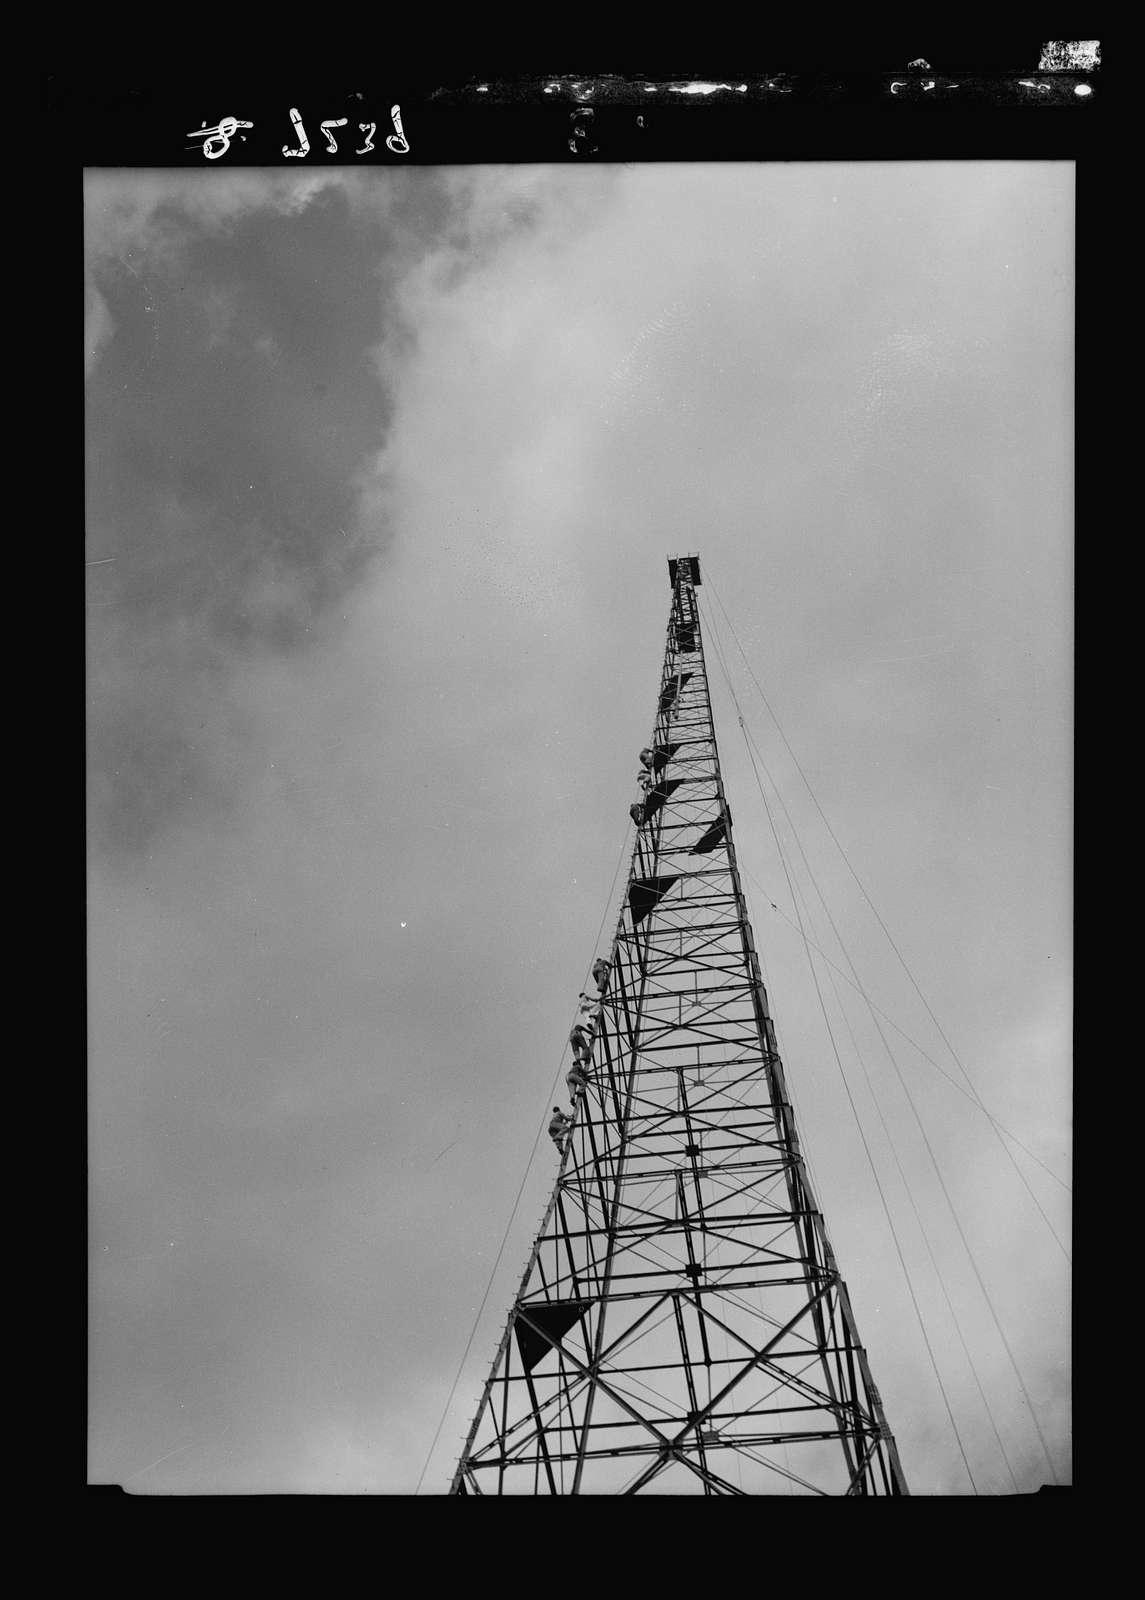 Int. i.e., international broadcasting station, Ramallah. Various of tower. Close up